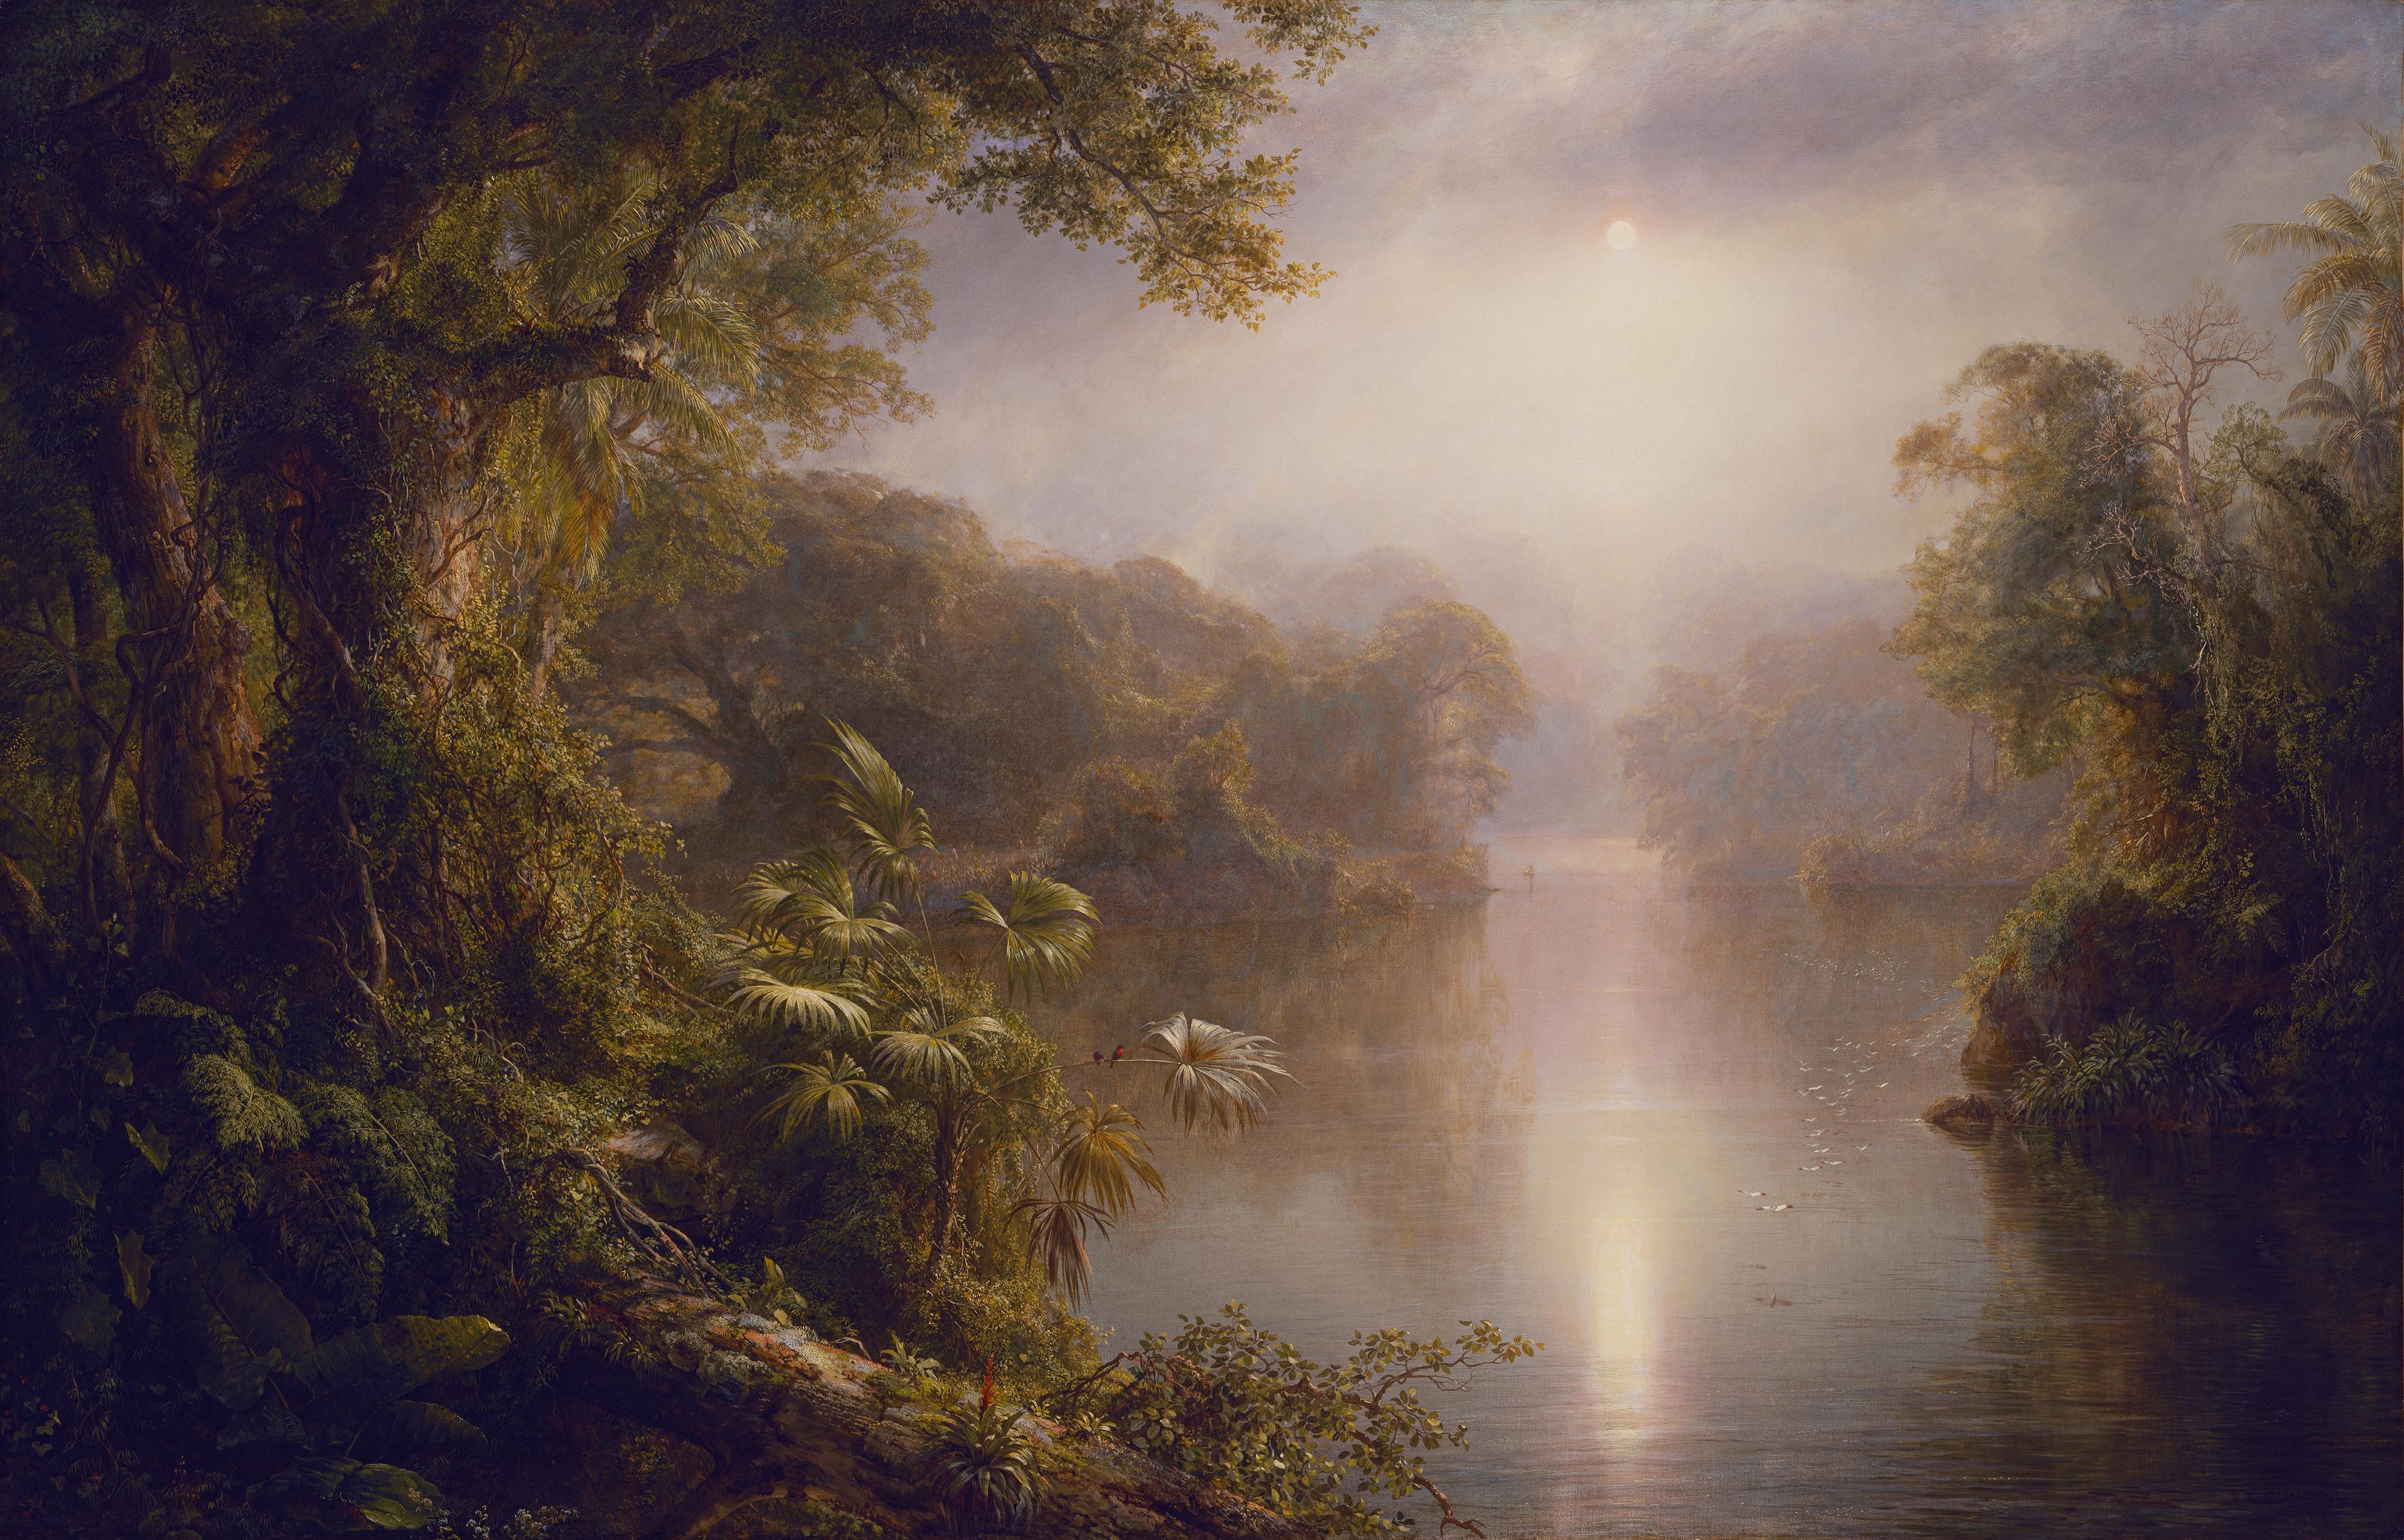 El R o de Luz (The River of Light, (1877), National Gallery of Art